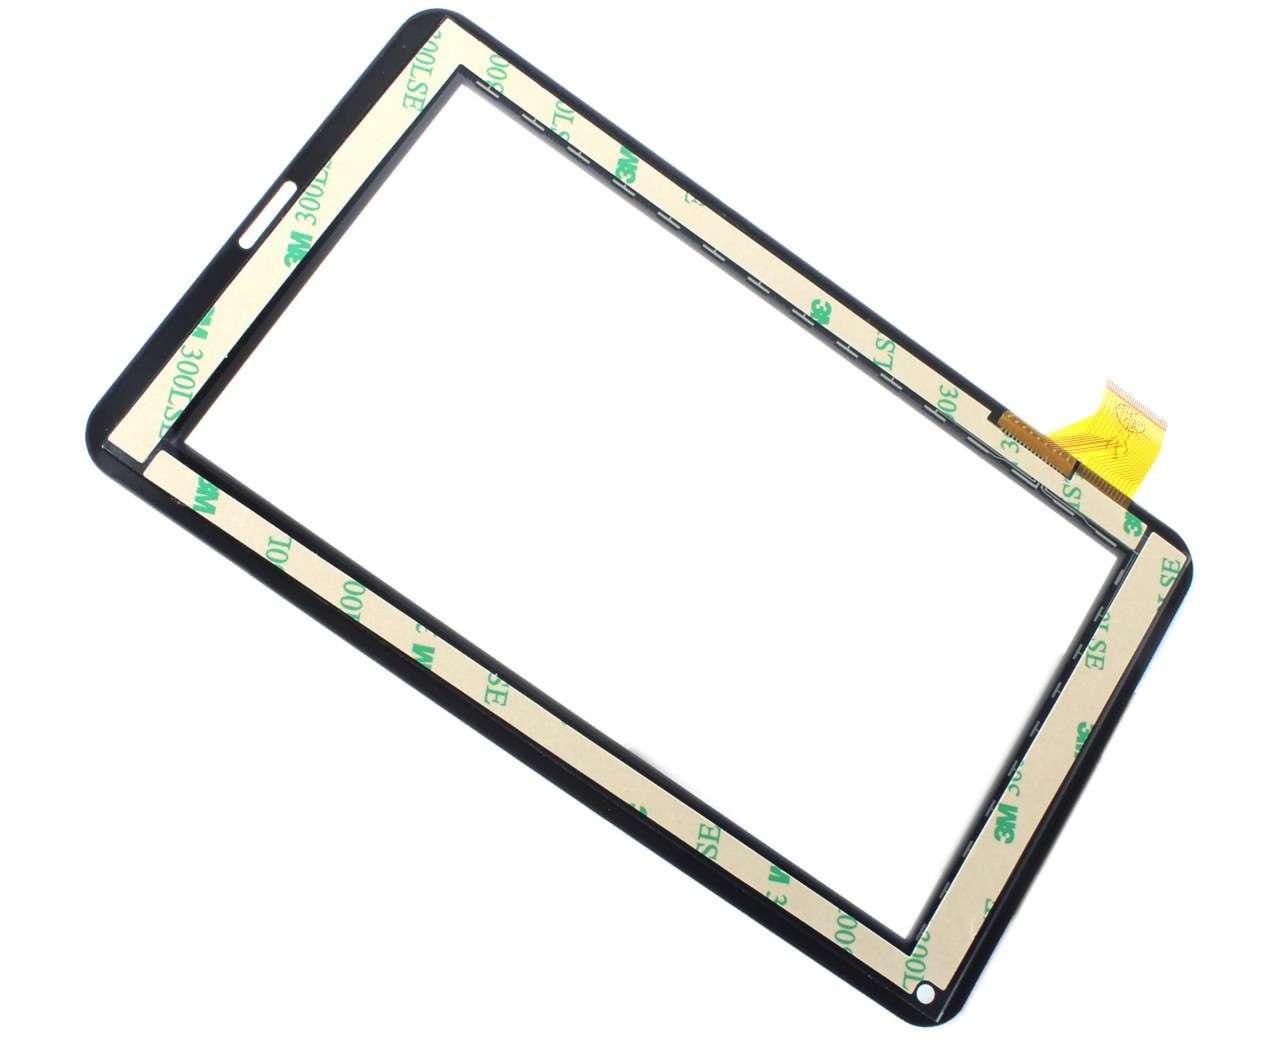 Touchscreen Digitizer MPMAN MPDC702 Geam Sticla Tableta imagine powerlaptop.ro 2021